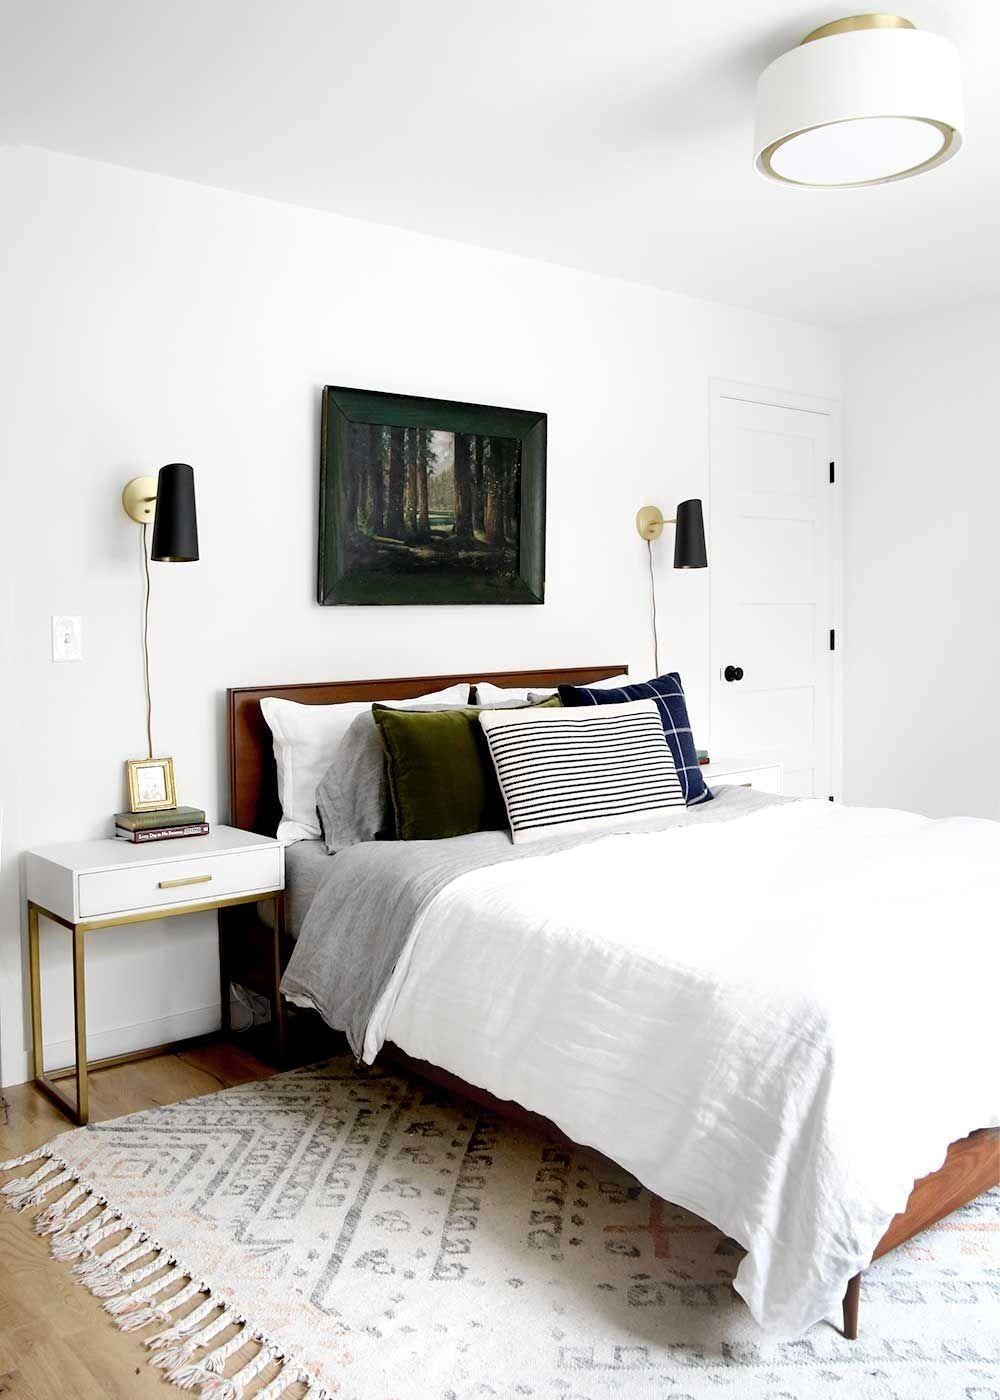 Pin By Ale Ssio On Bedroom Mens Bedroom Decor Masculine Master Bedroom Minimalist Bedroom Design